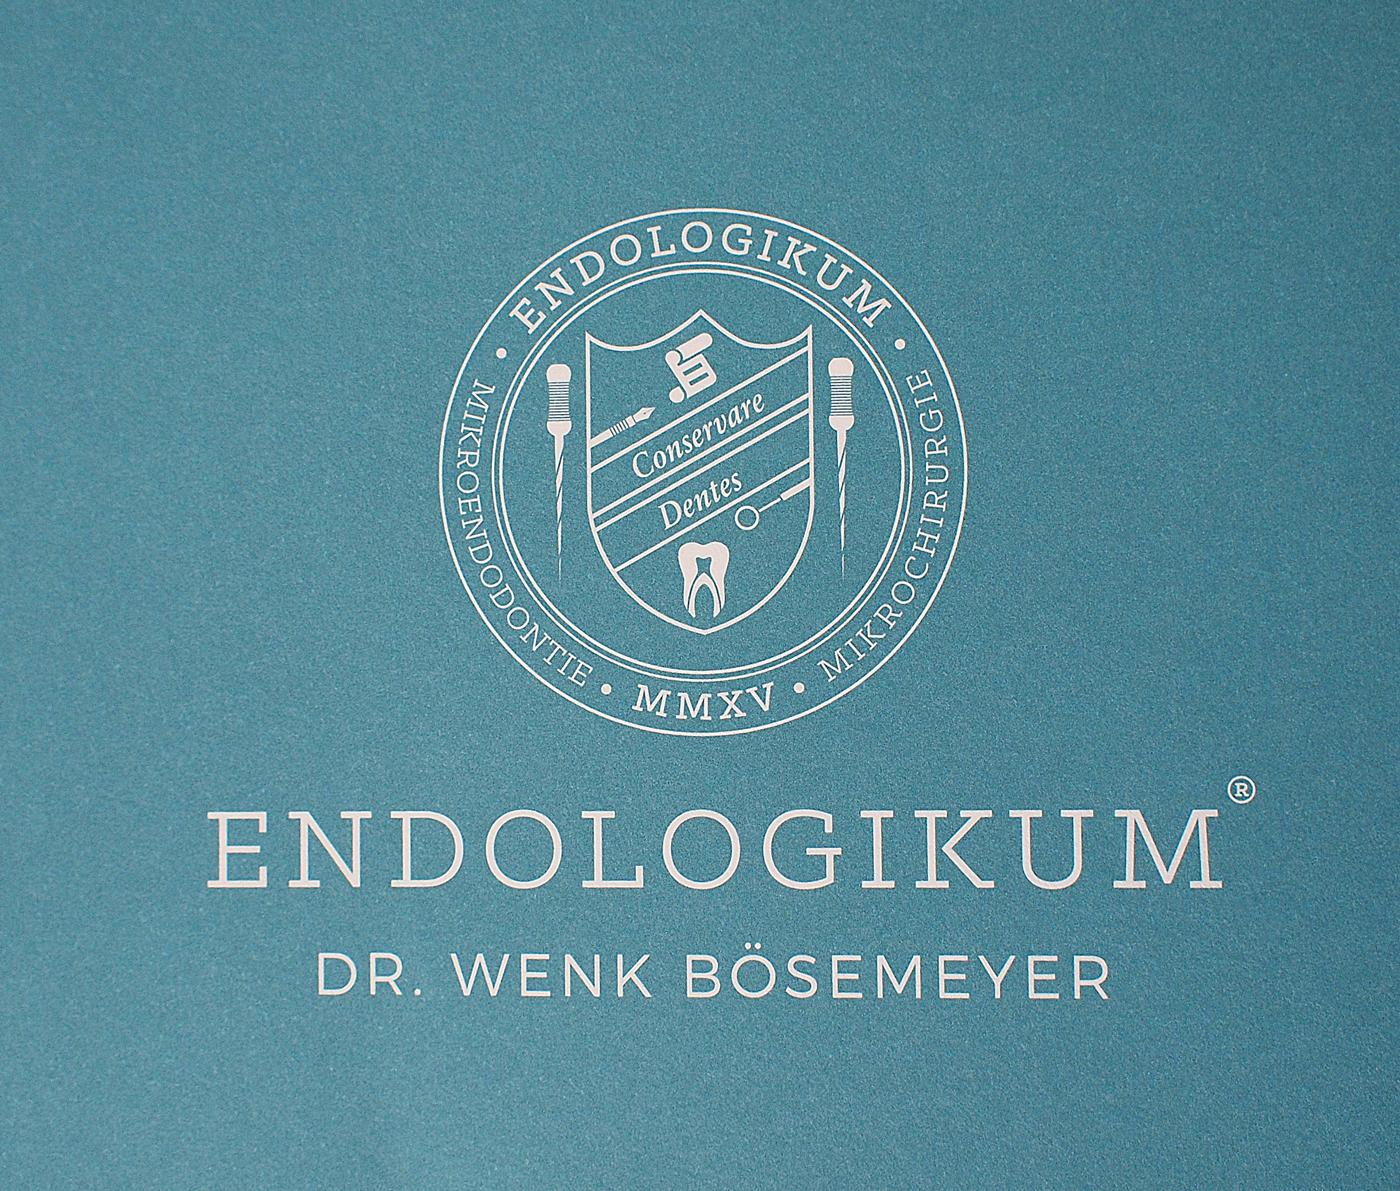 endologikum_logo_web